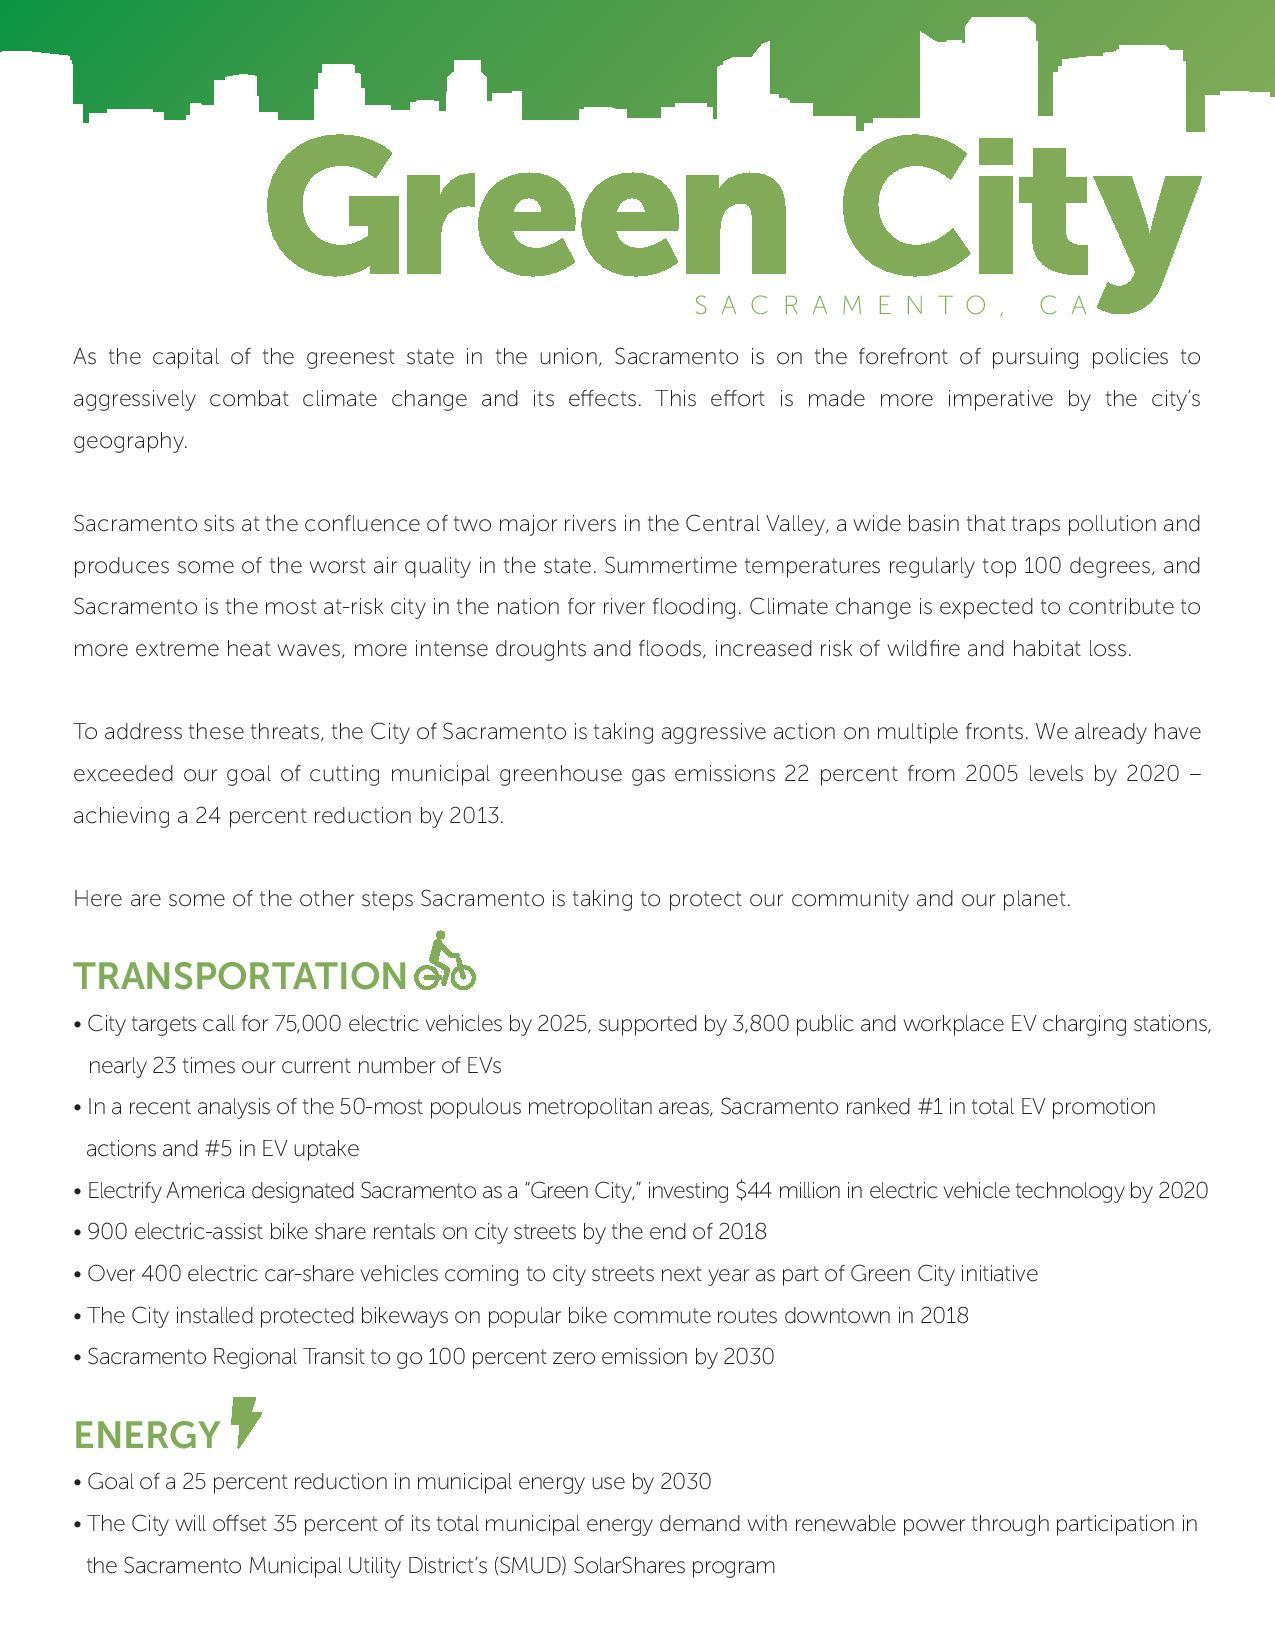 greencity-jpg.jpg